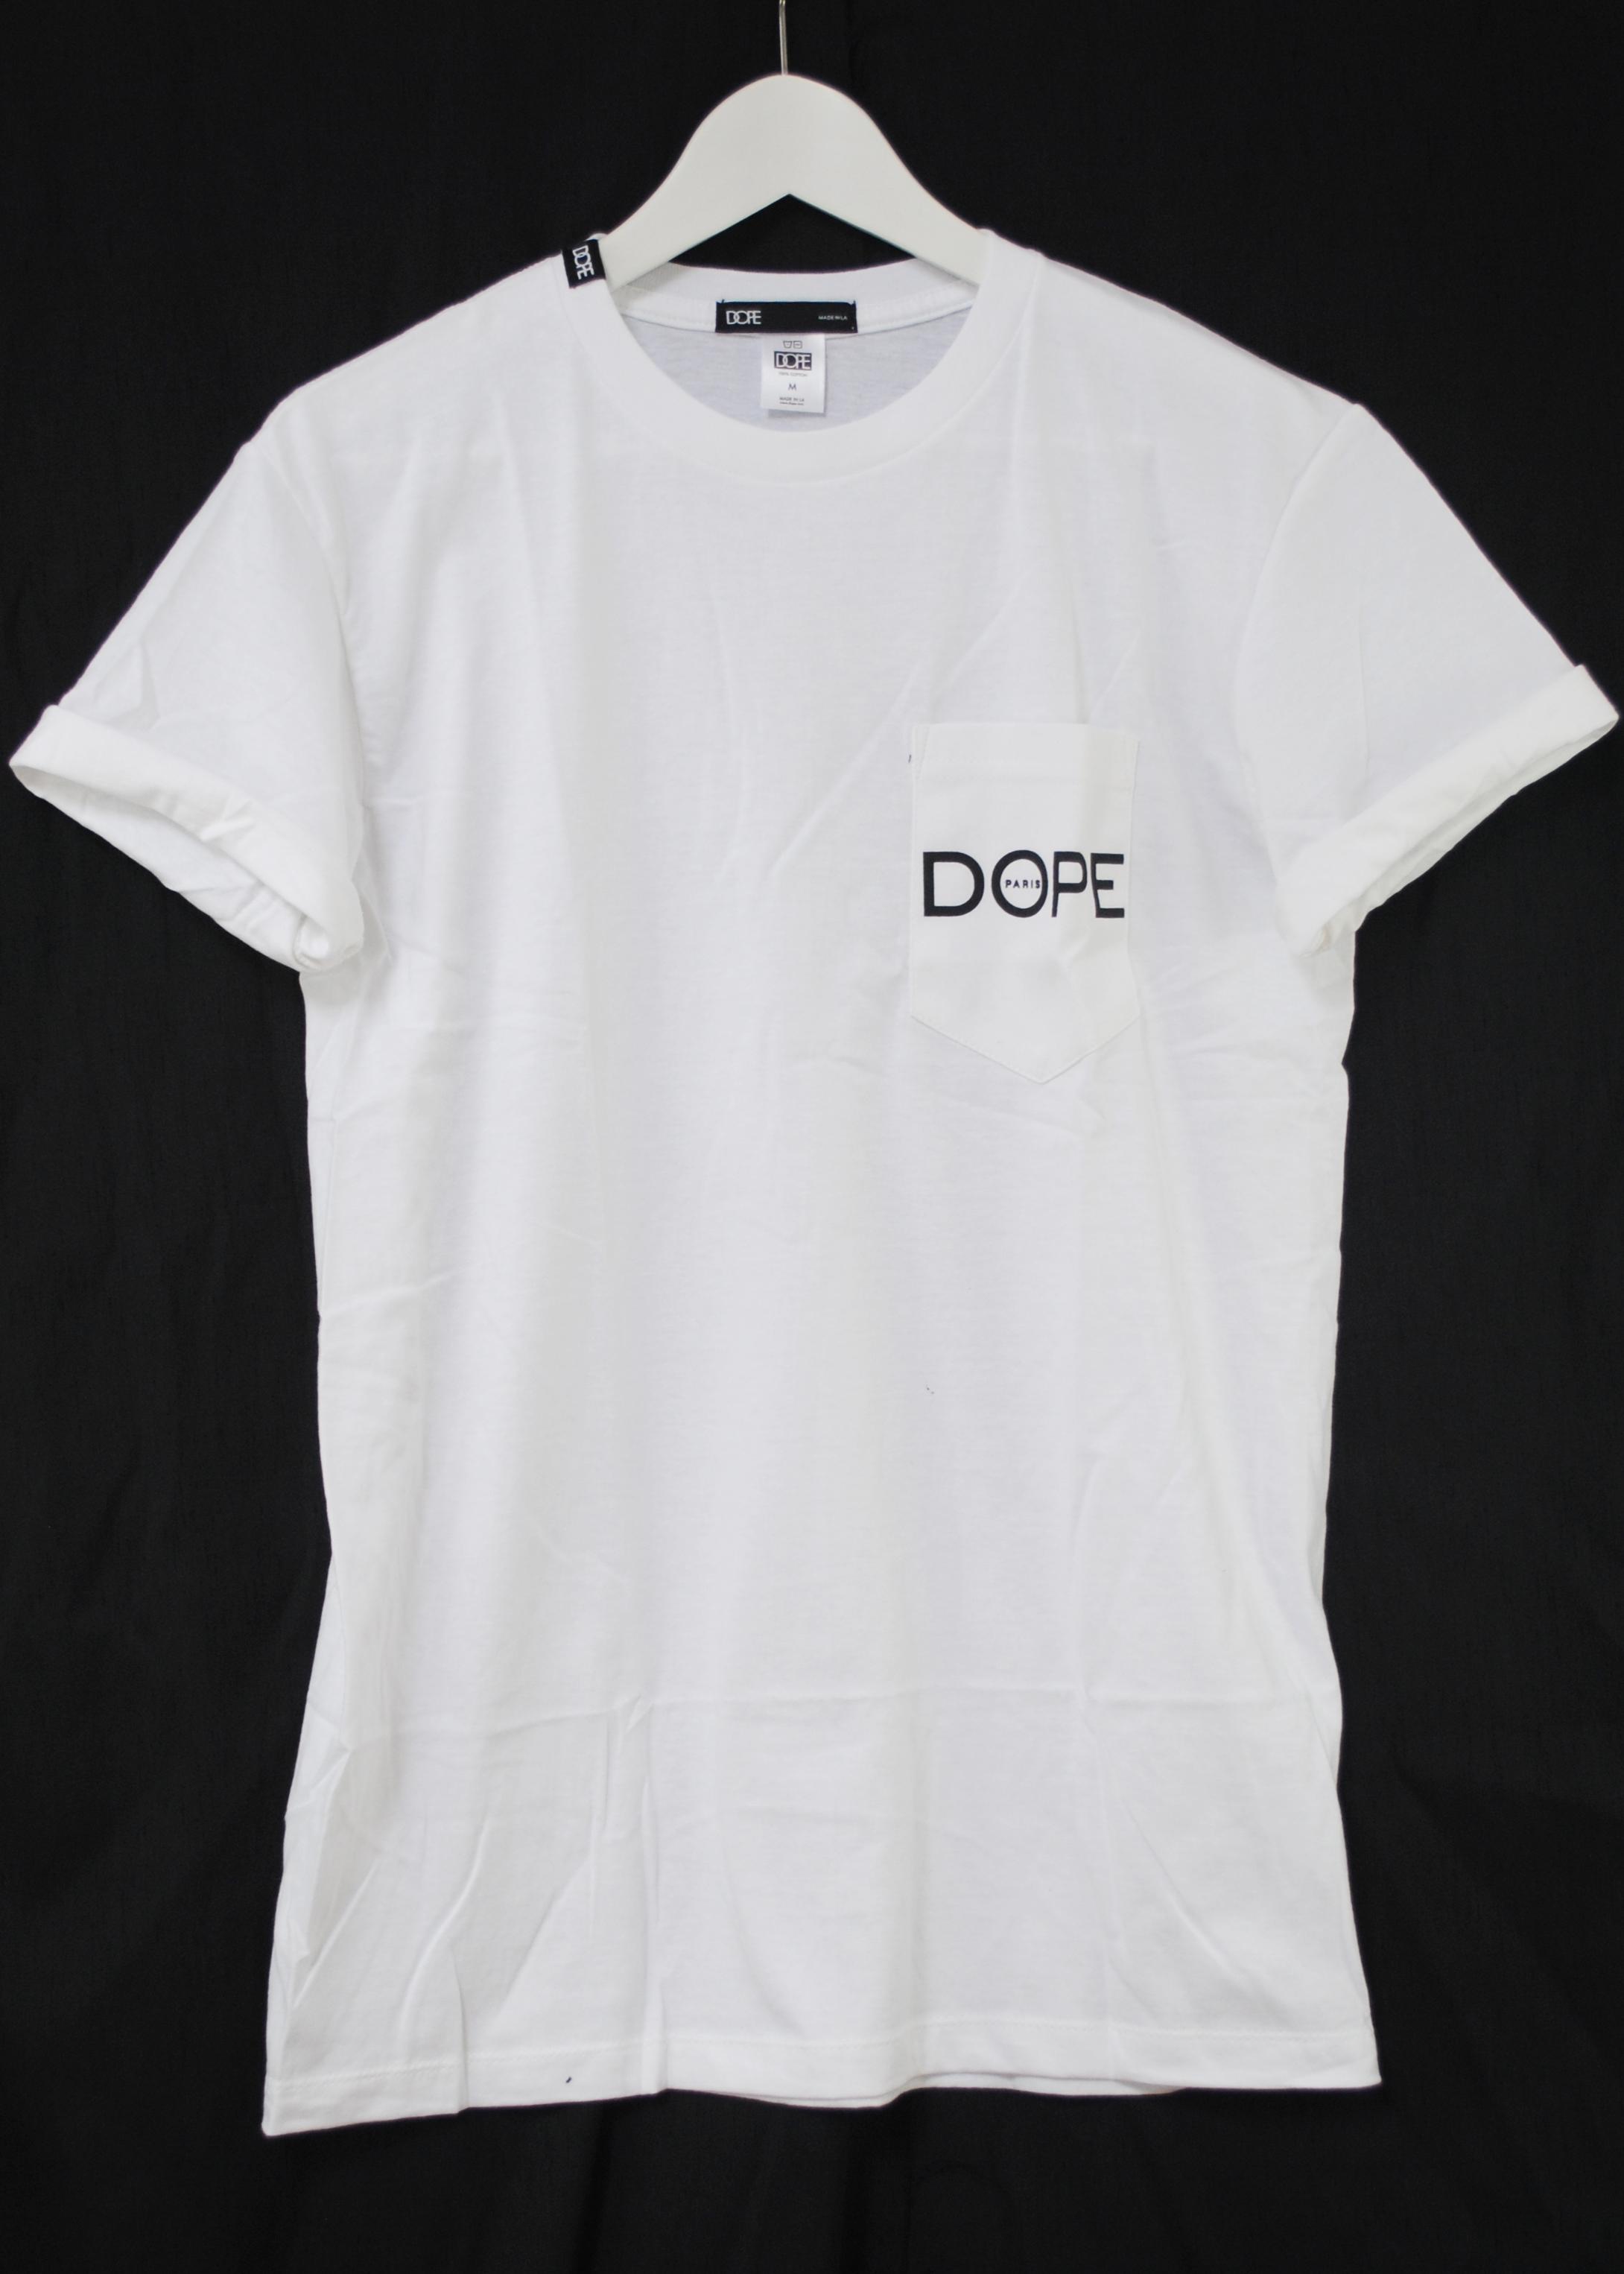 Black t shirt ebay - Dope Couture Mediterranean Paris Pocket White Urban Crew